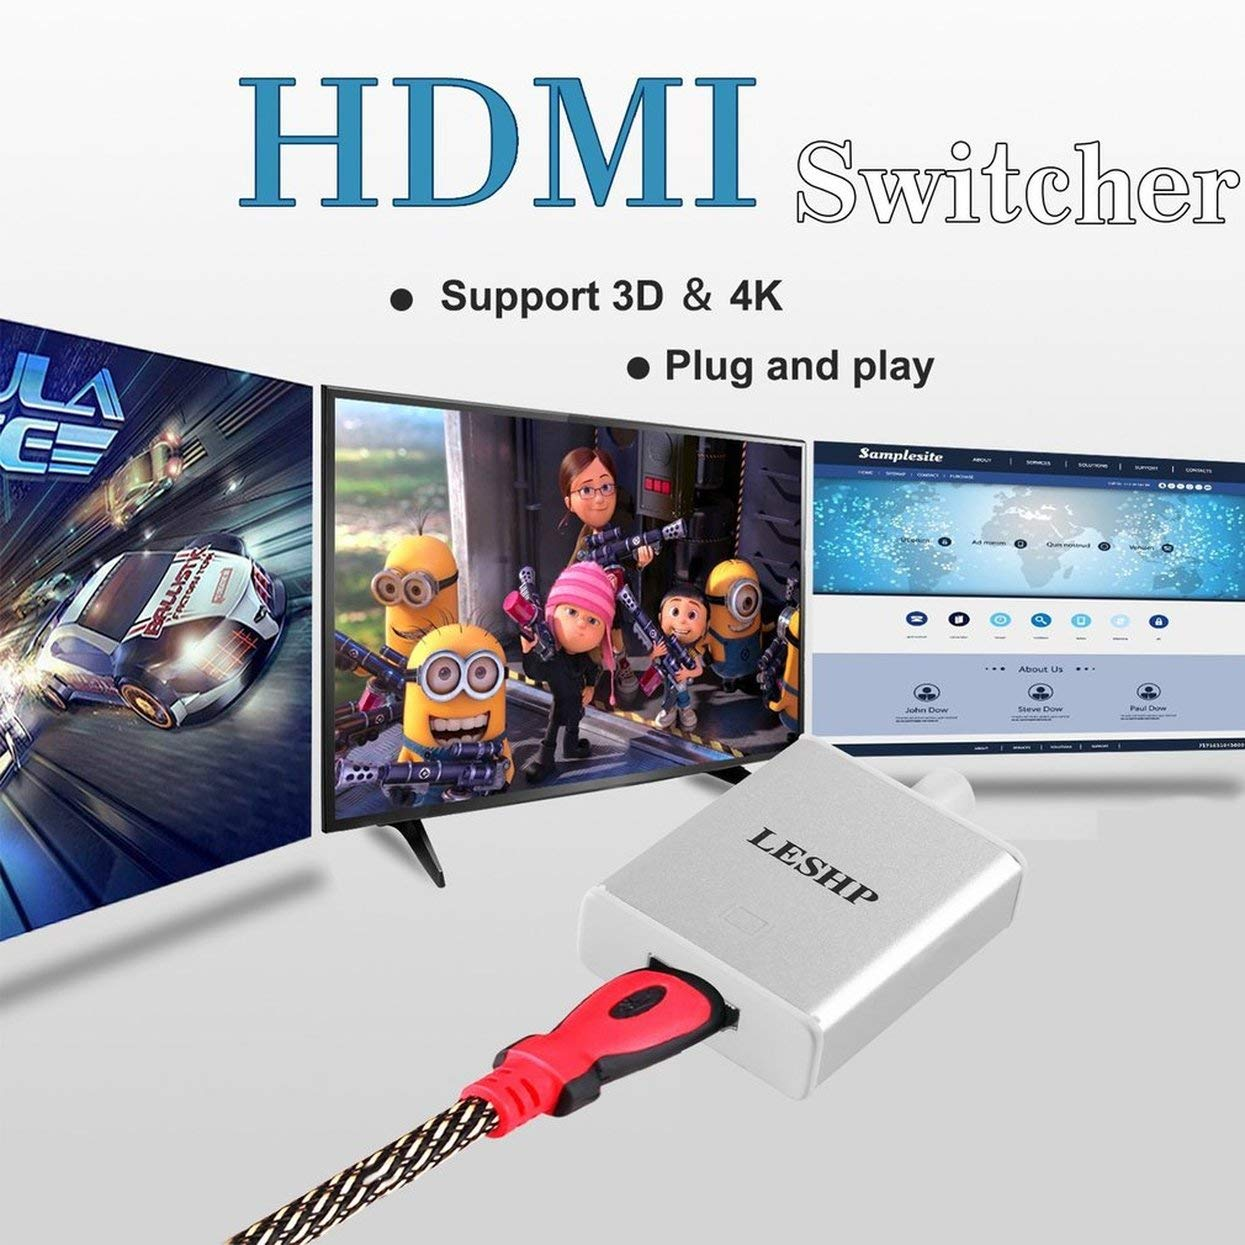 Tree-on-Life USB 3.1 Tipo C a USB 3.0,4K HDMI Adaptador multipuerto AV Digital USB-C para Macbook 12 Pulgadas Google Chromebook Pixel HP Pavilion x2